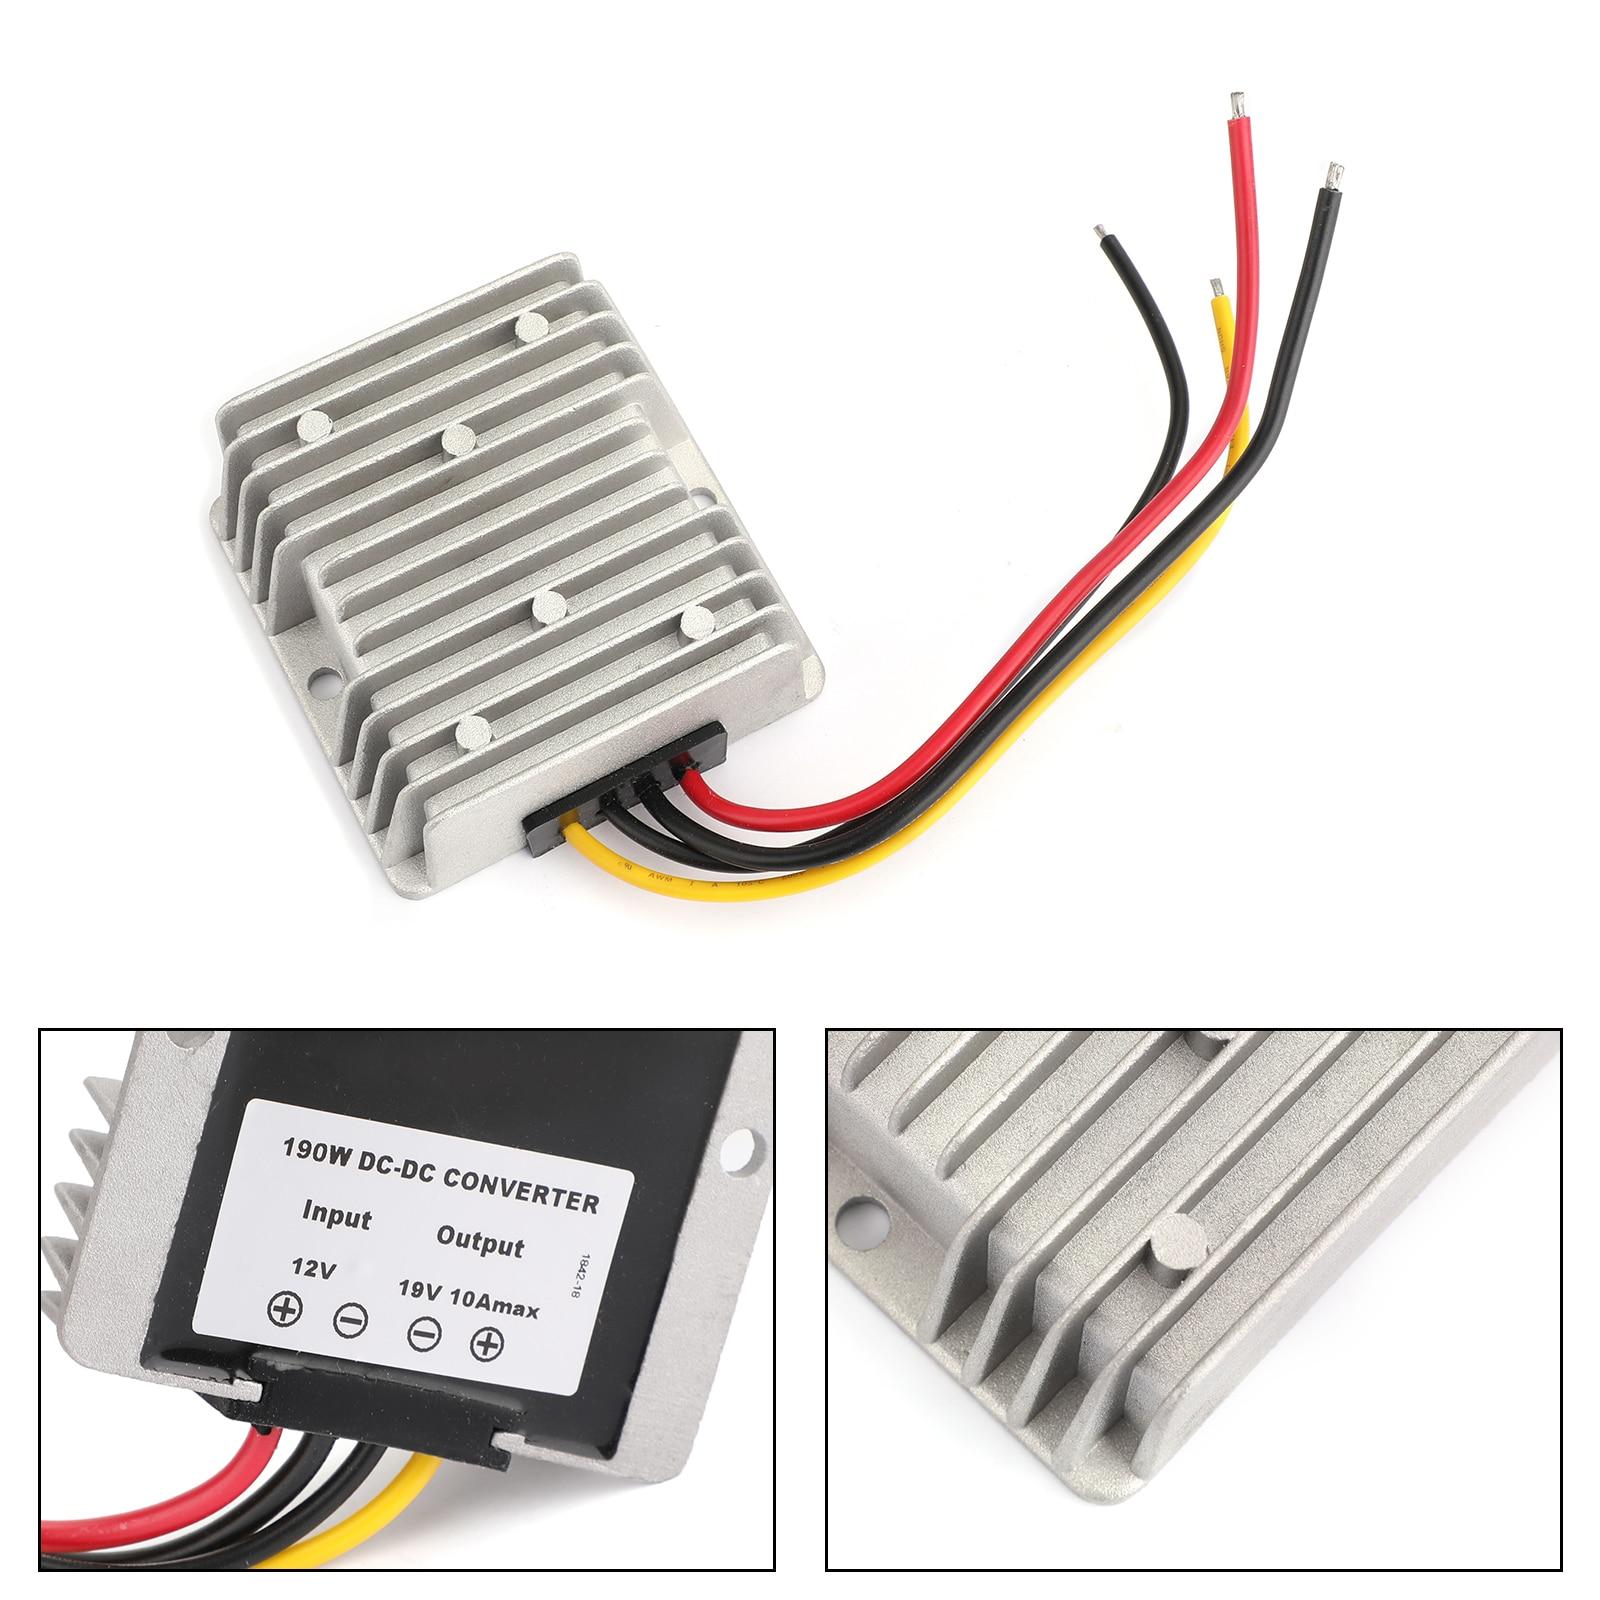 Areyourshop 12 فولت إلى 19 فولت DC-DC دفعة تصعيد محول طاقة الجهد 10A 190 واط وحدة منظم الفولتية